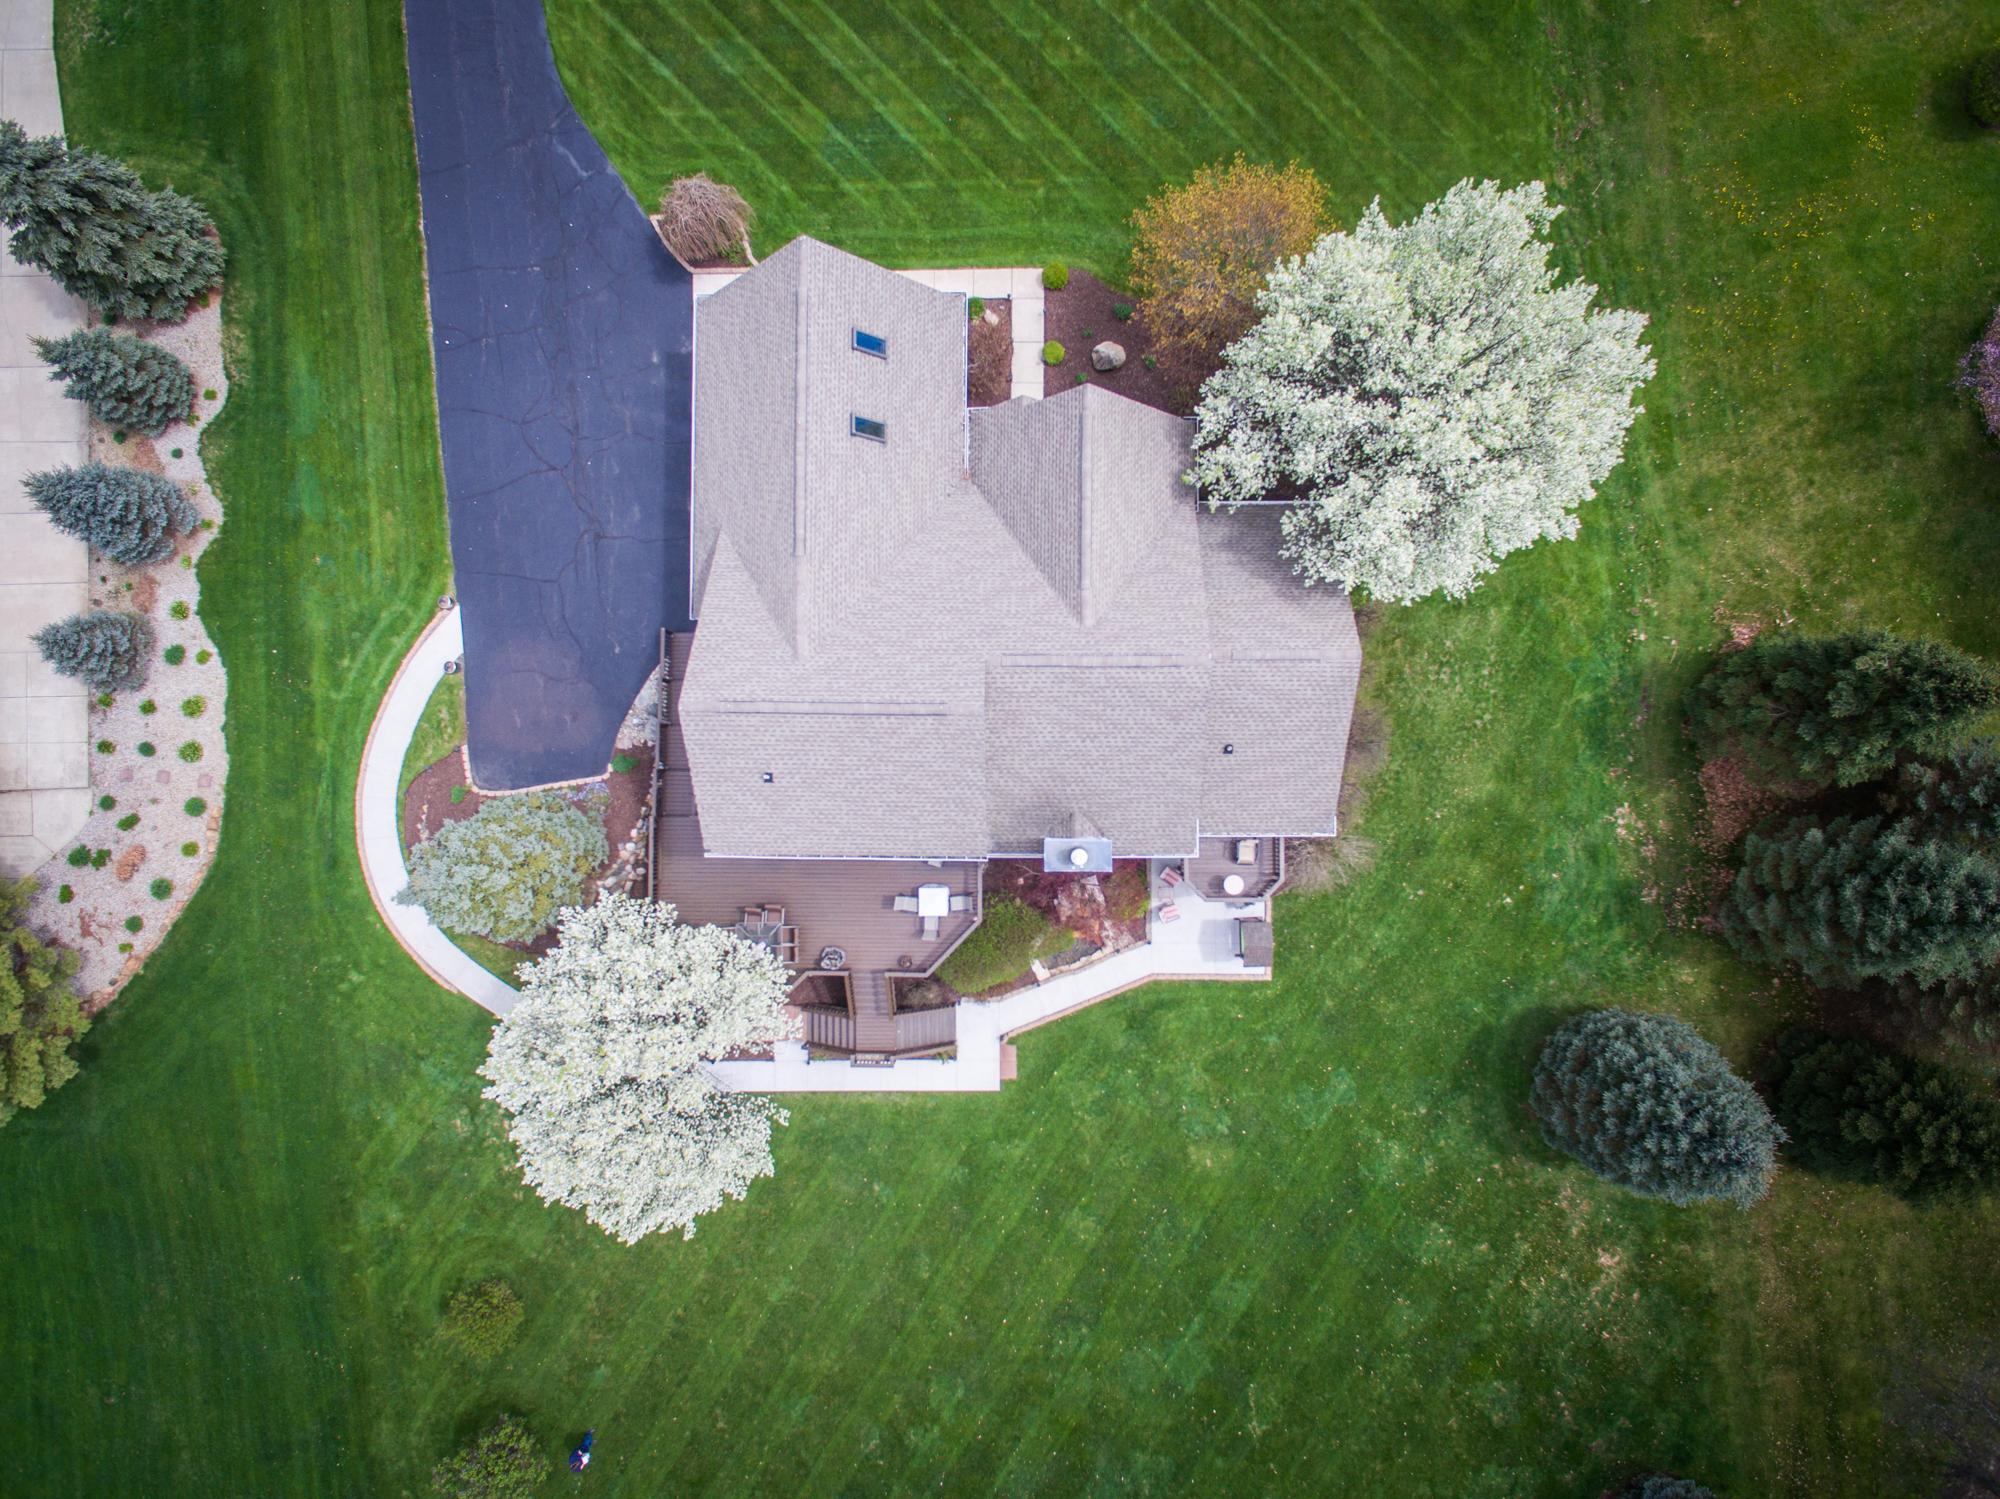 sundance meadows drone-4.jpg